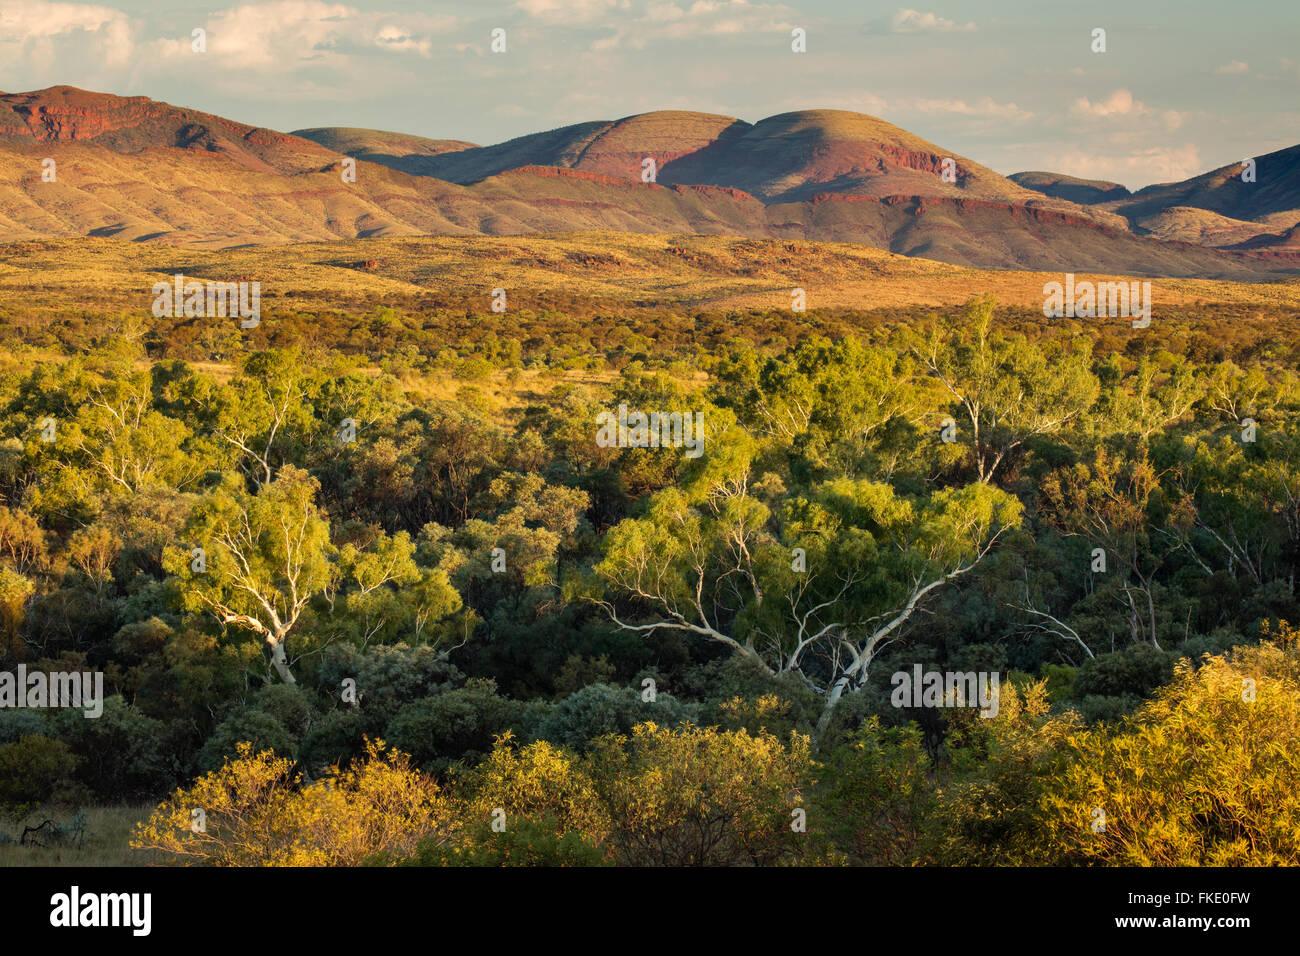 Pilbara, Western Australia - Stock Image